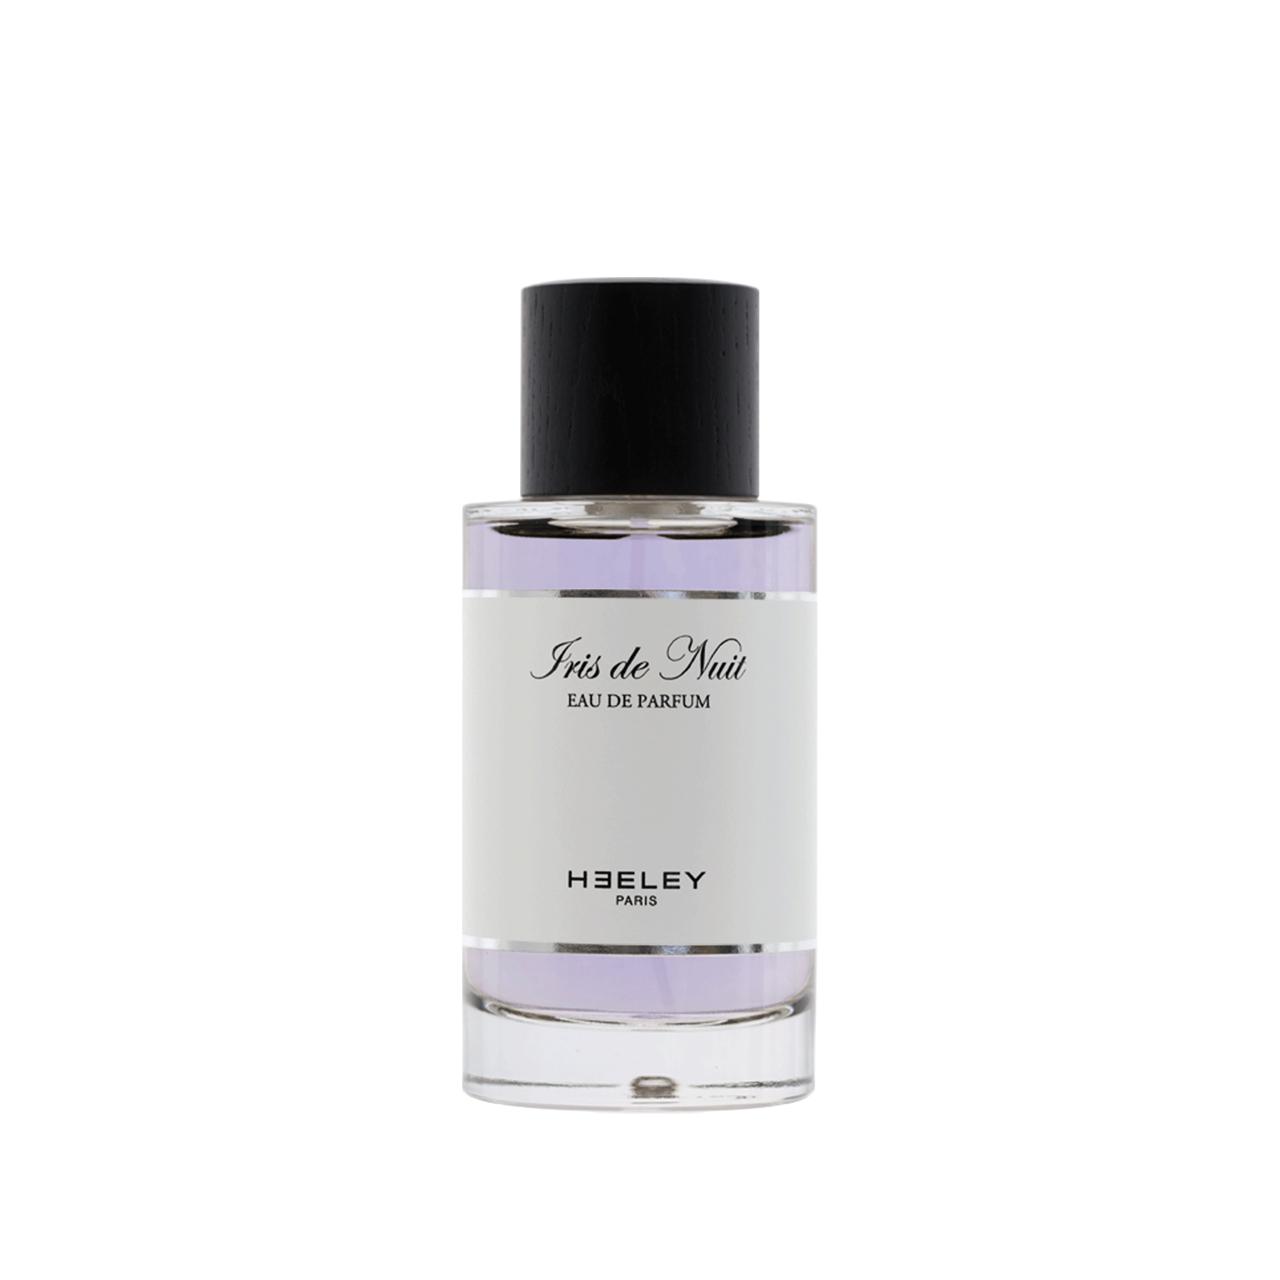 Iris de Nuit - Eau de Parfum